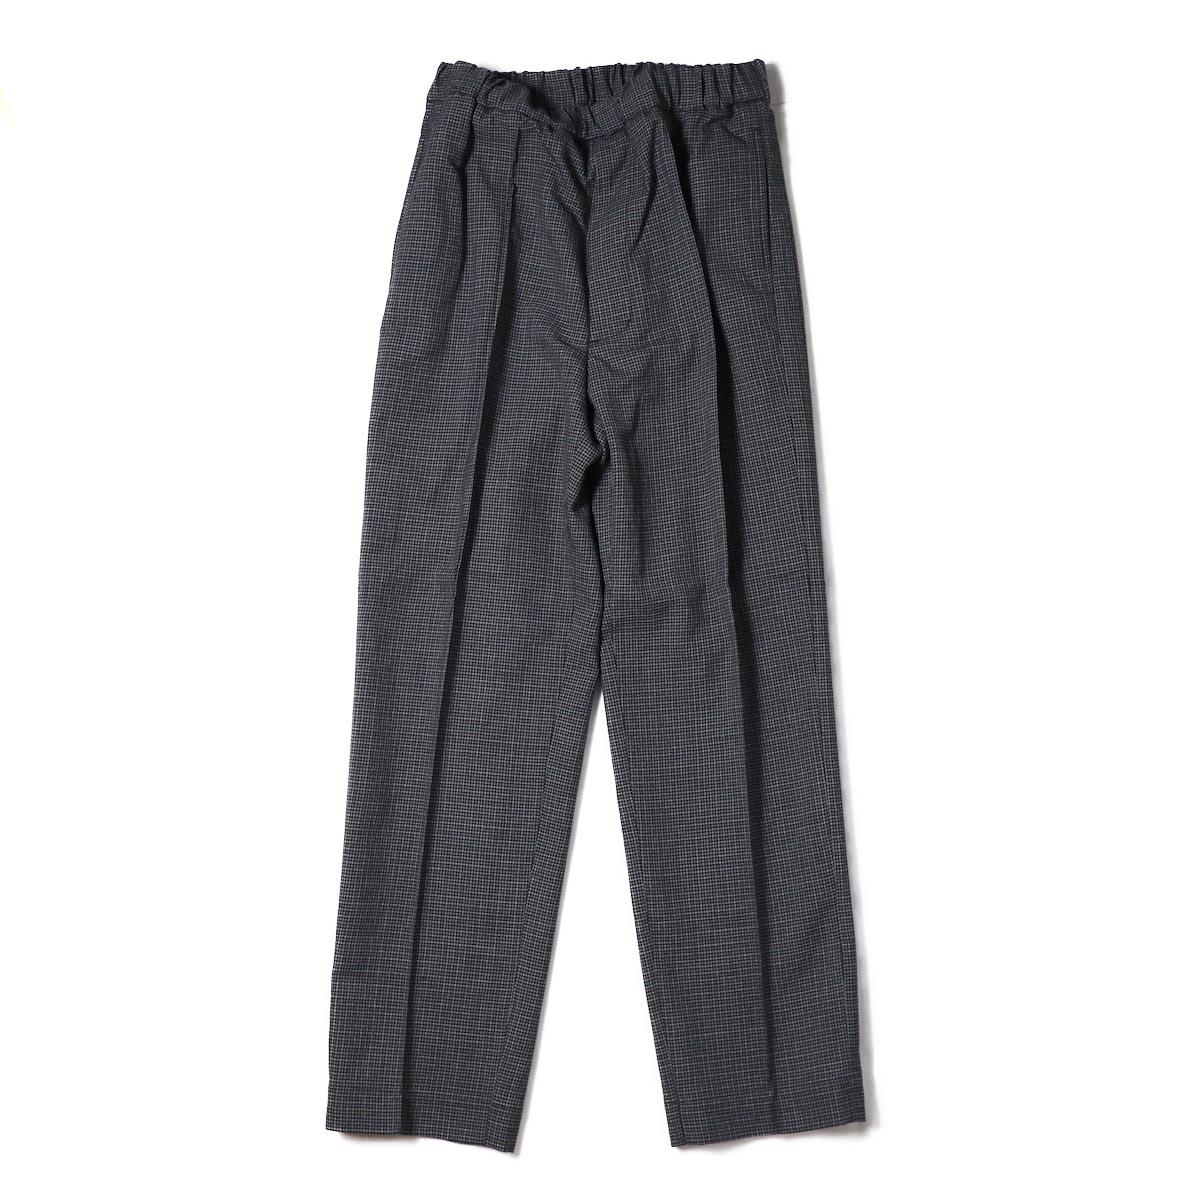 Kaptain Sunshine / Crease Tucked Easy Pants -Grey Hound's Tooth